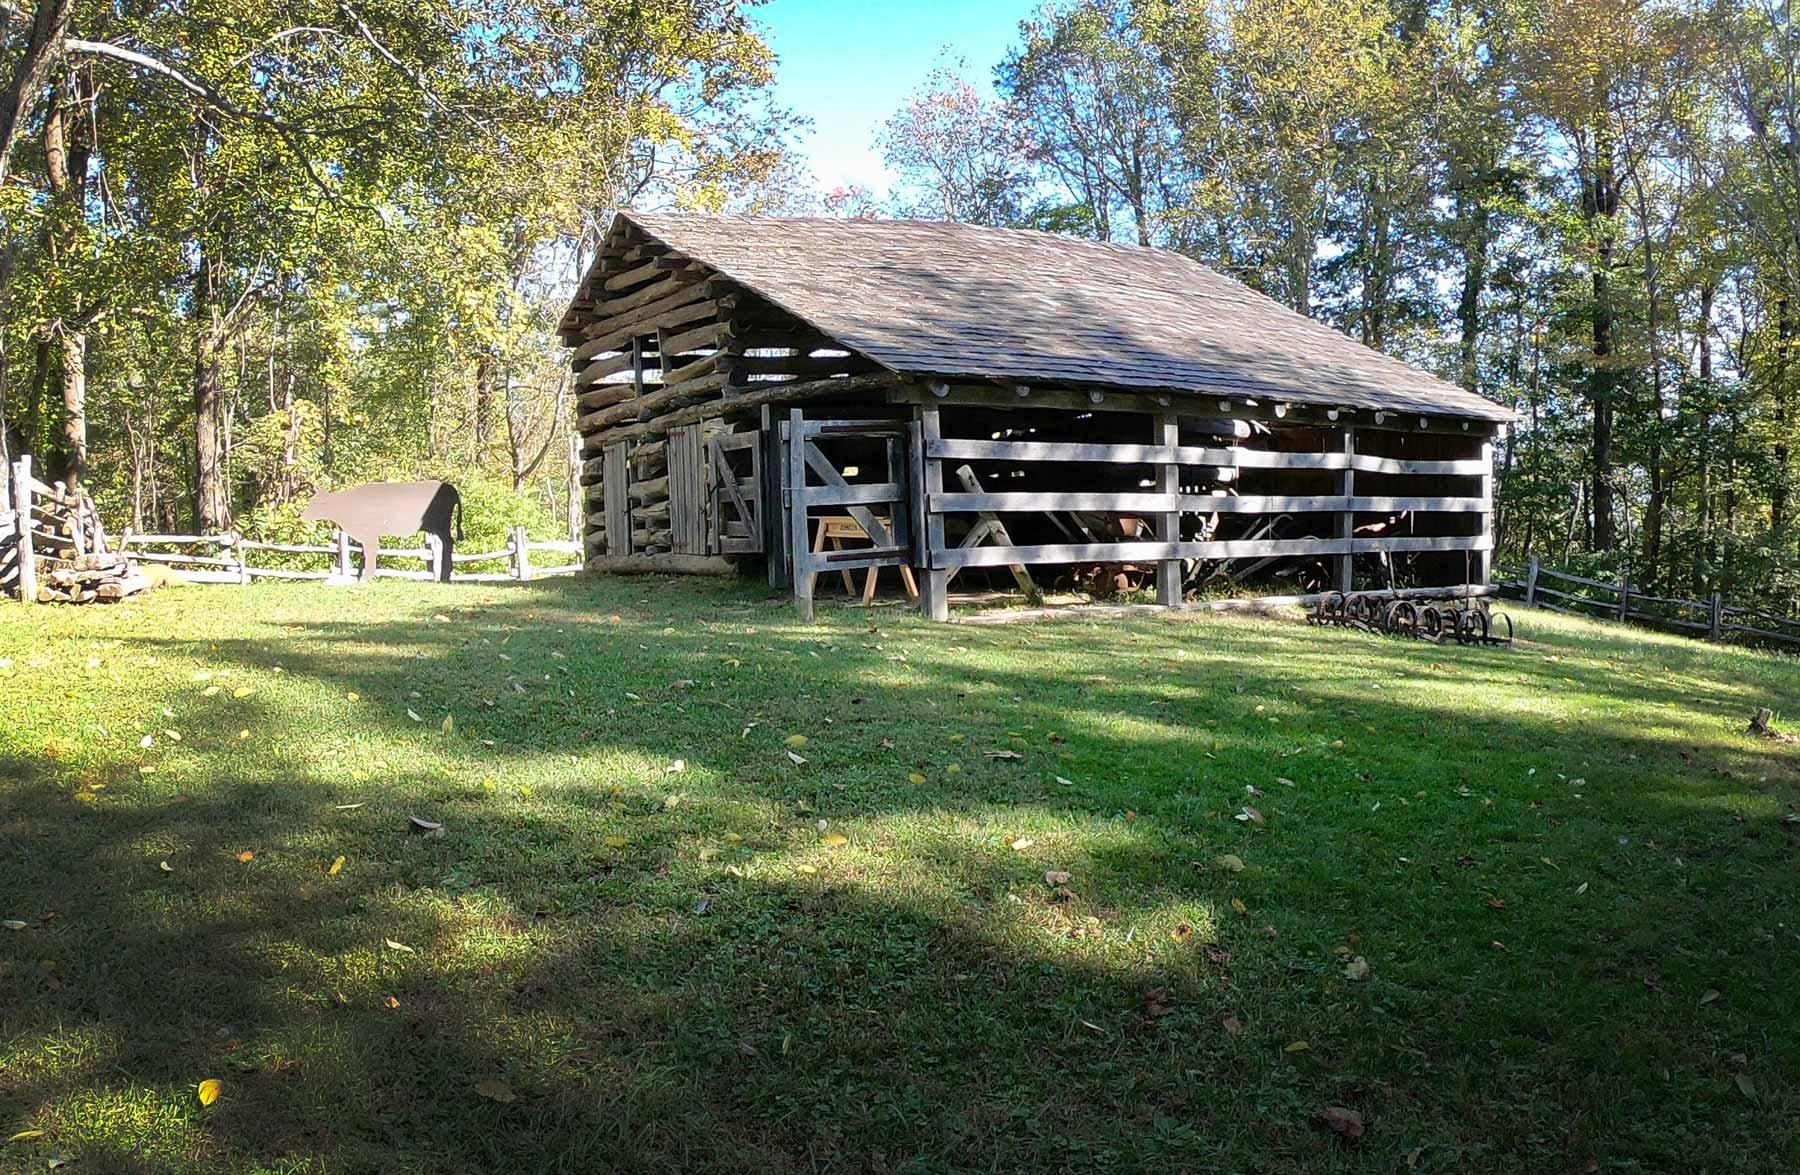 Mountain farm building on the Johnson Farm Loop Trail at Peaks of Otter, Virginia